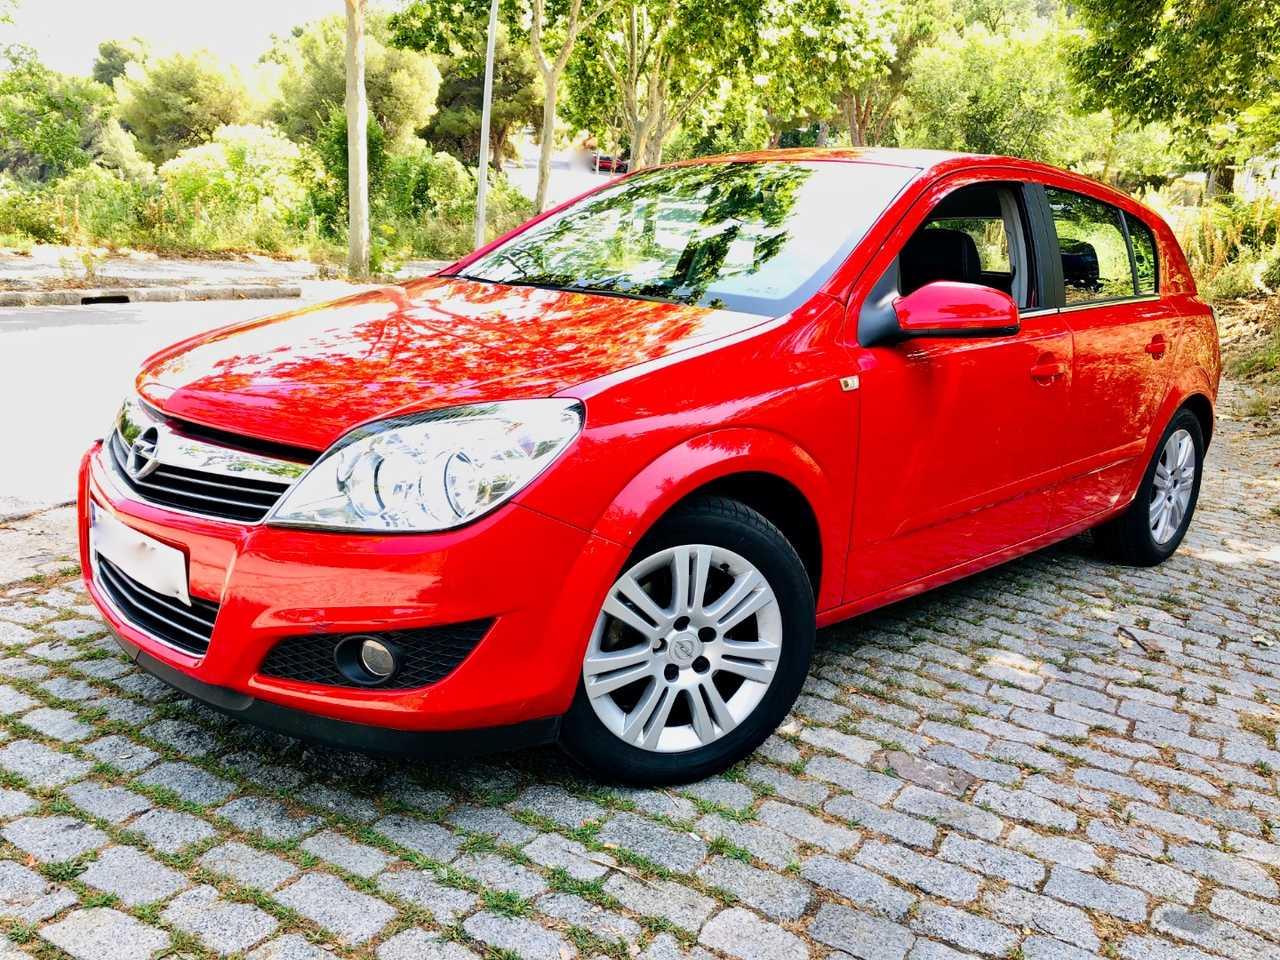 Opel Astra 1.8 16v 140cv Cosmo Auto. IMPECABLE.   - Foto 1